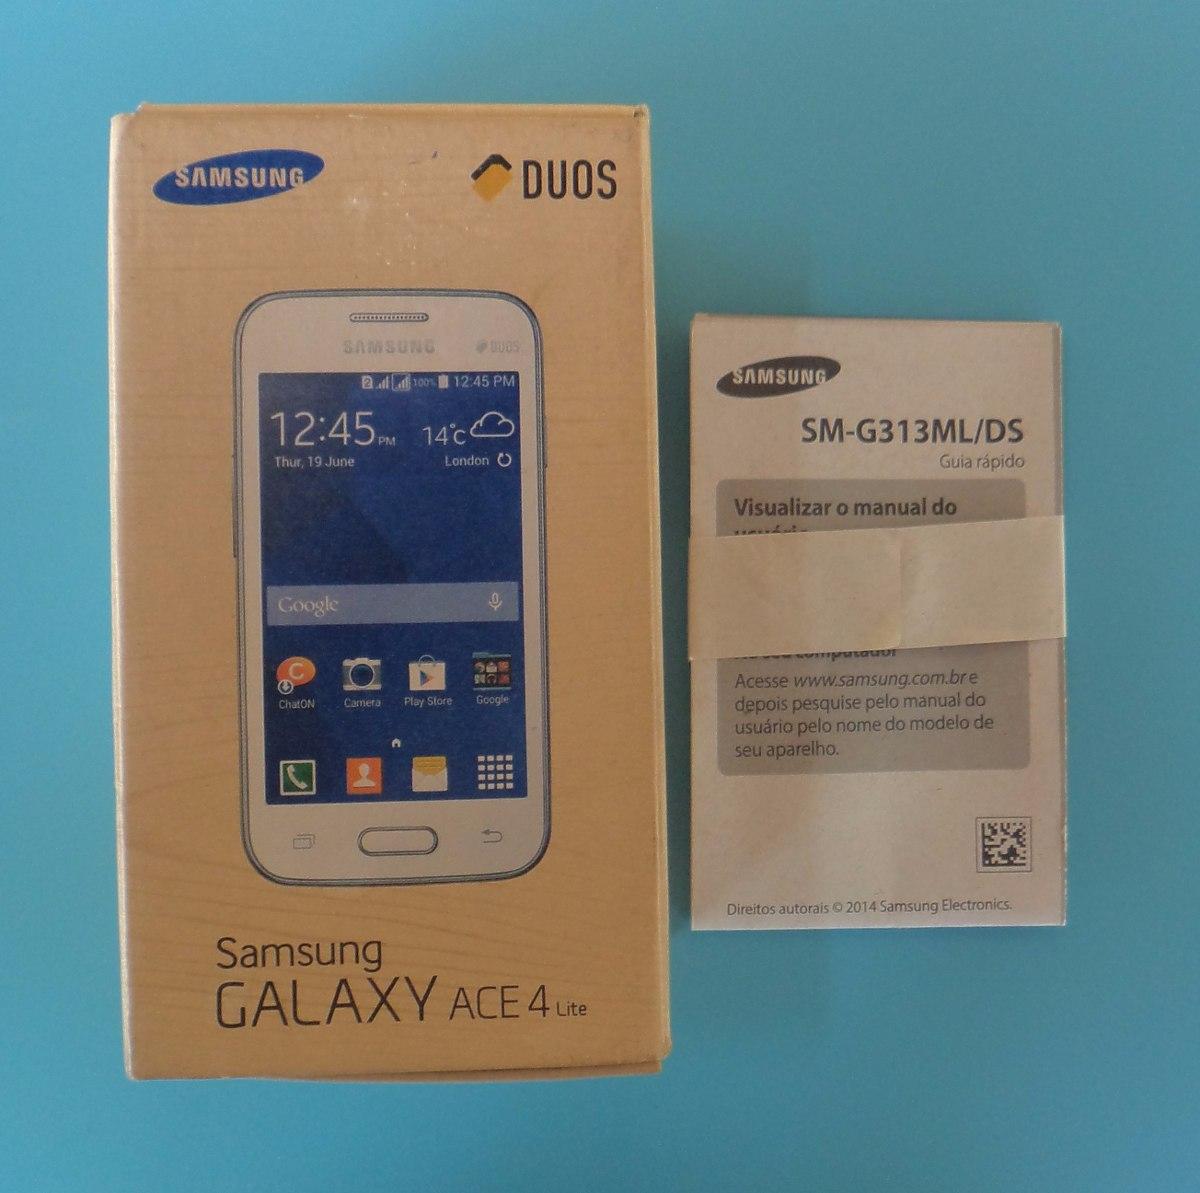 Samsung Galaxy Ace 4 Lte Manual Espanol Gallery